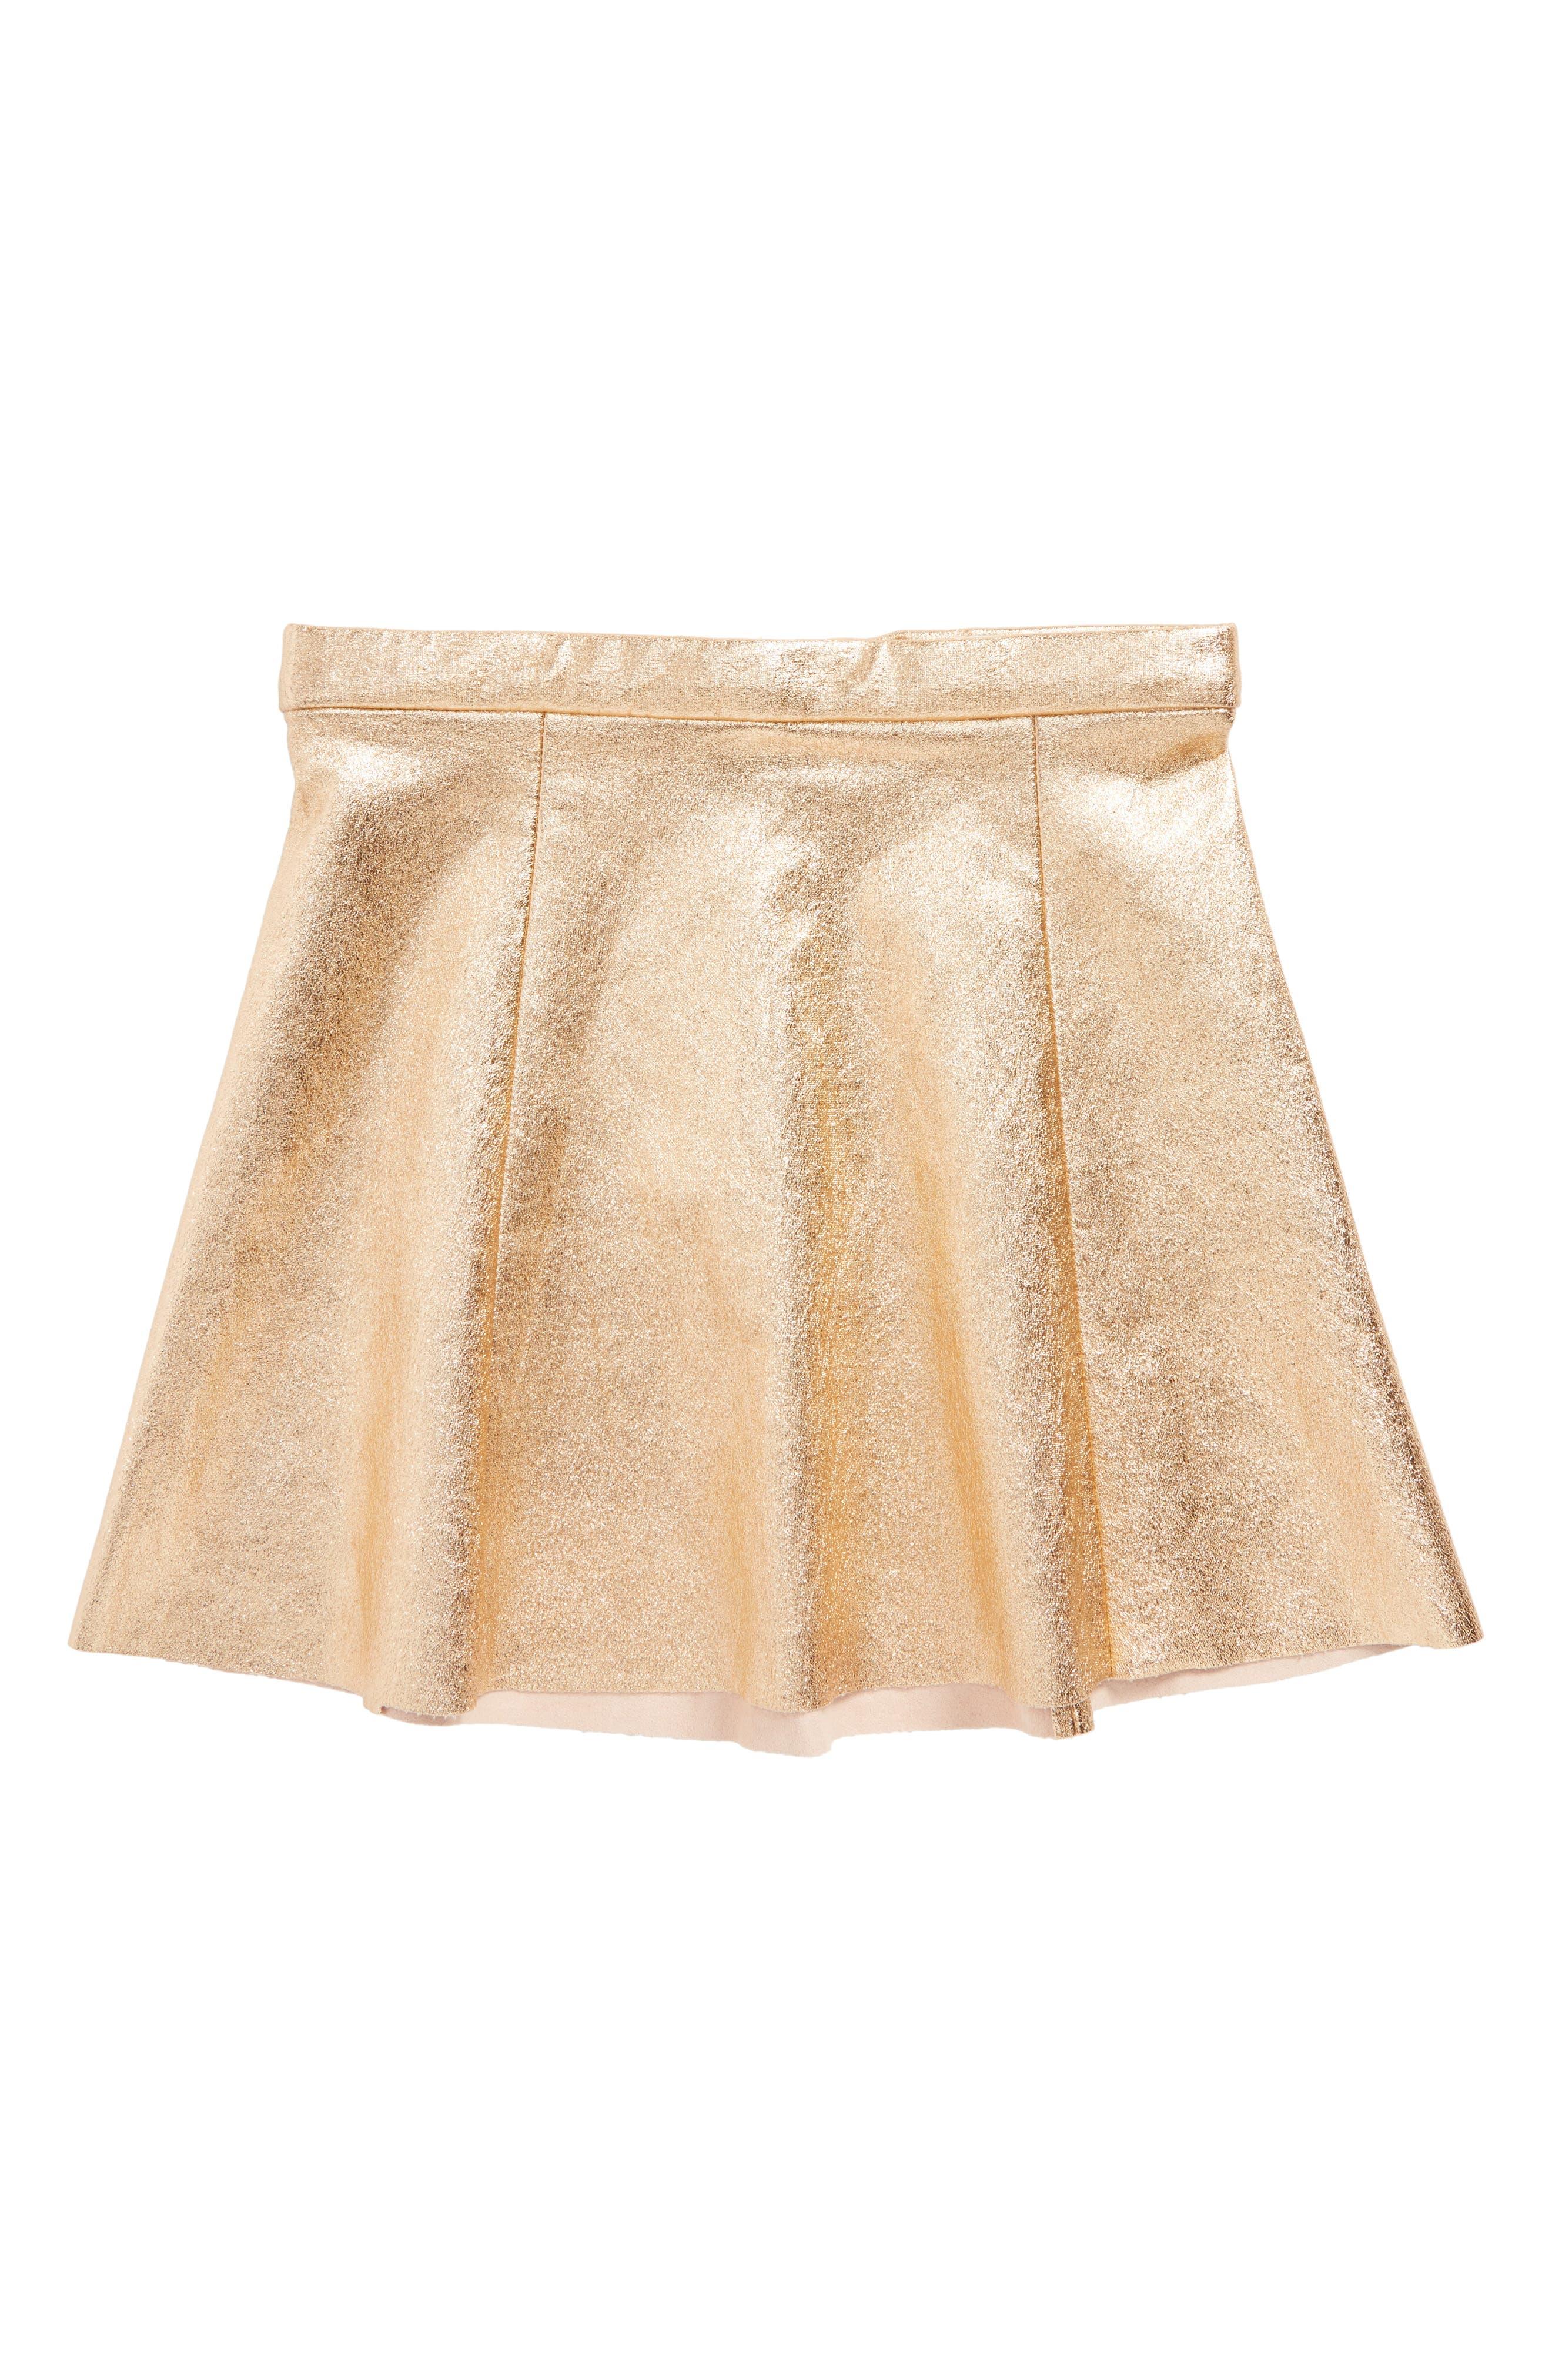 metallic skirt,                             Main thumbnail 1, color,                             652